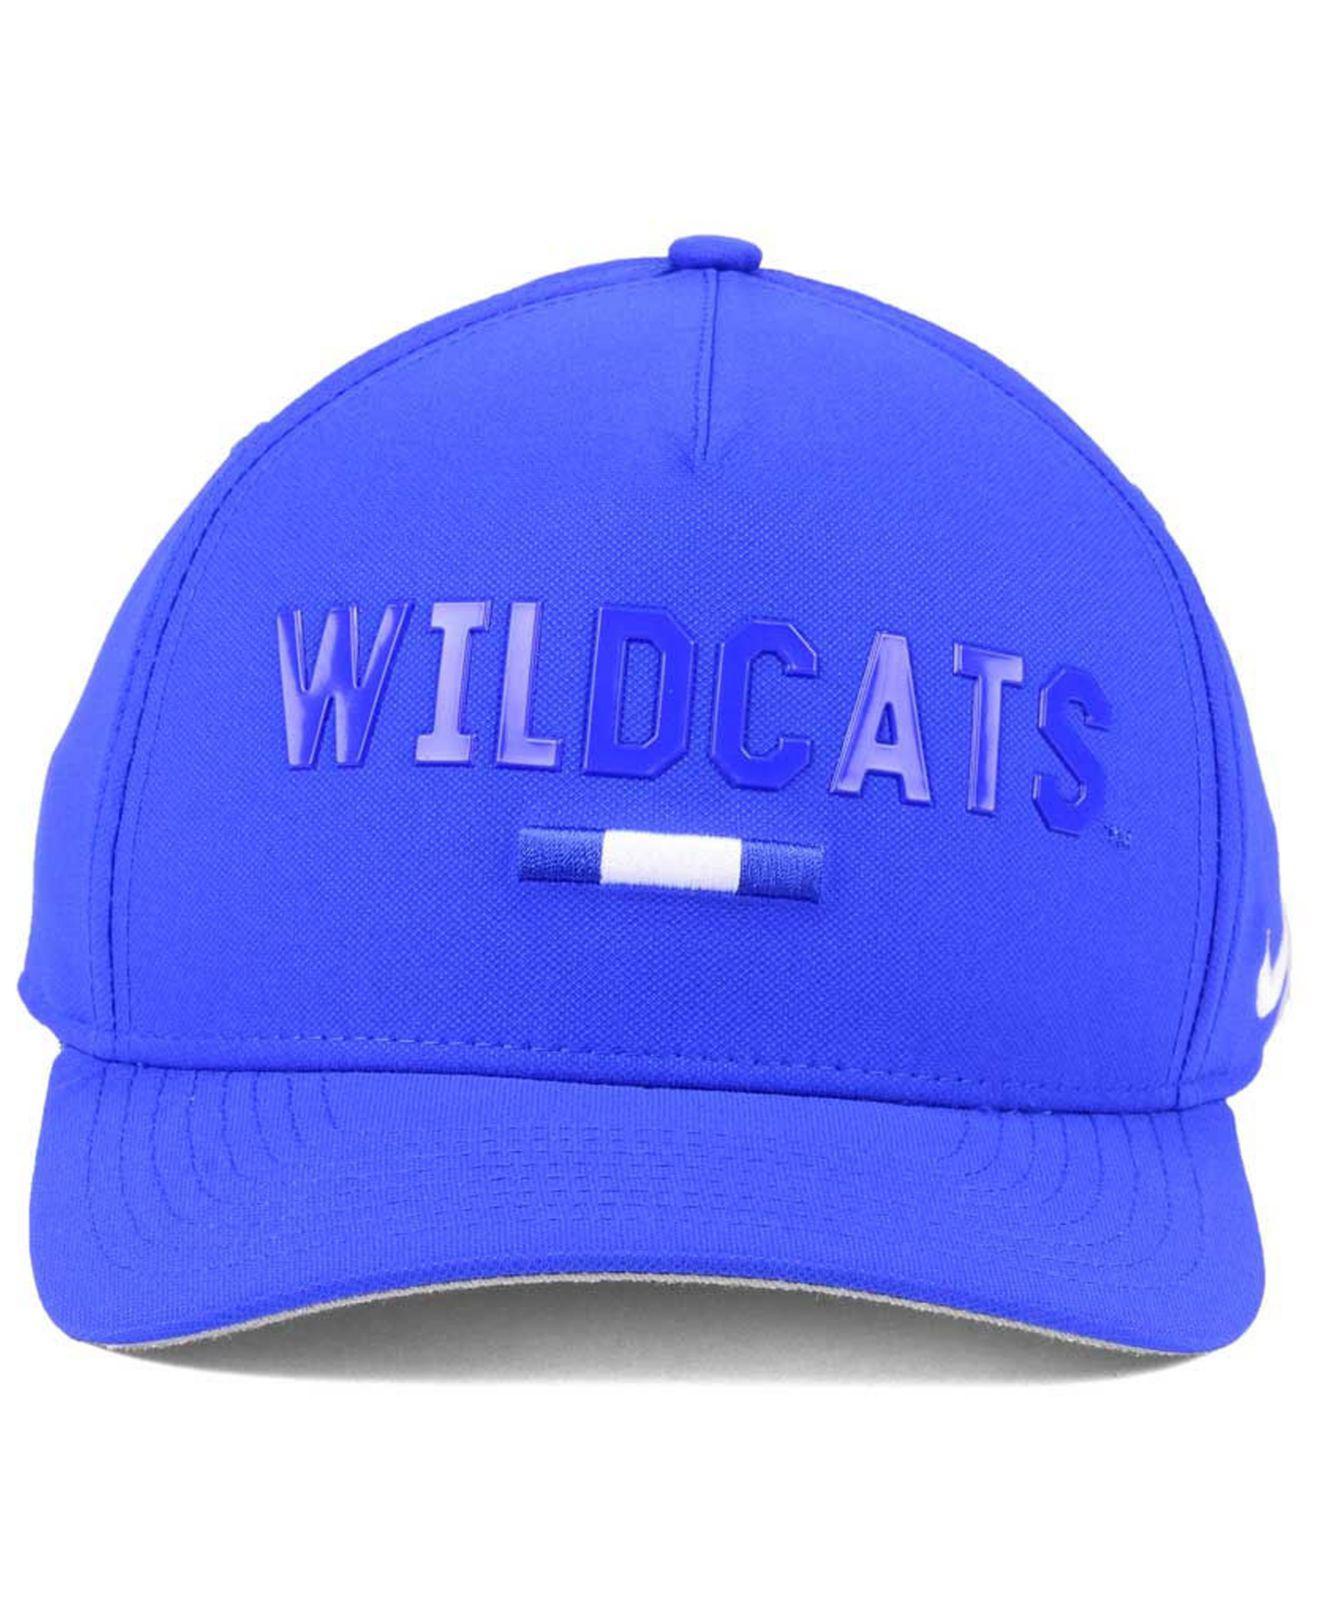 size 40 463f8 bcfe7 ... sideline coaches swoosh performance flex hat 37047 e719d  australia get  lyst nike kentucky wildcats summer seasonal swoosh flex cap in 126d9 67ca1  f1d69 ...